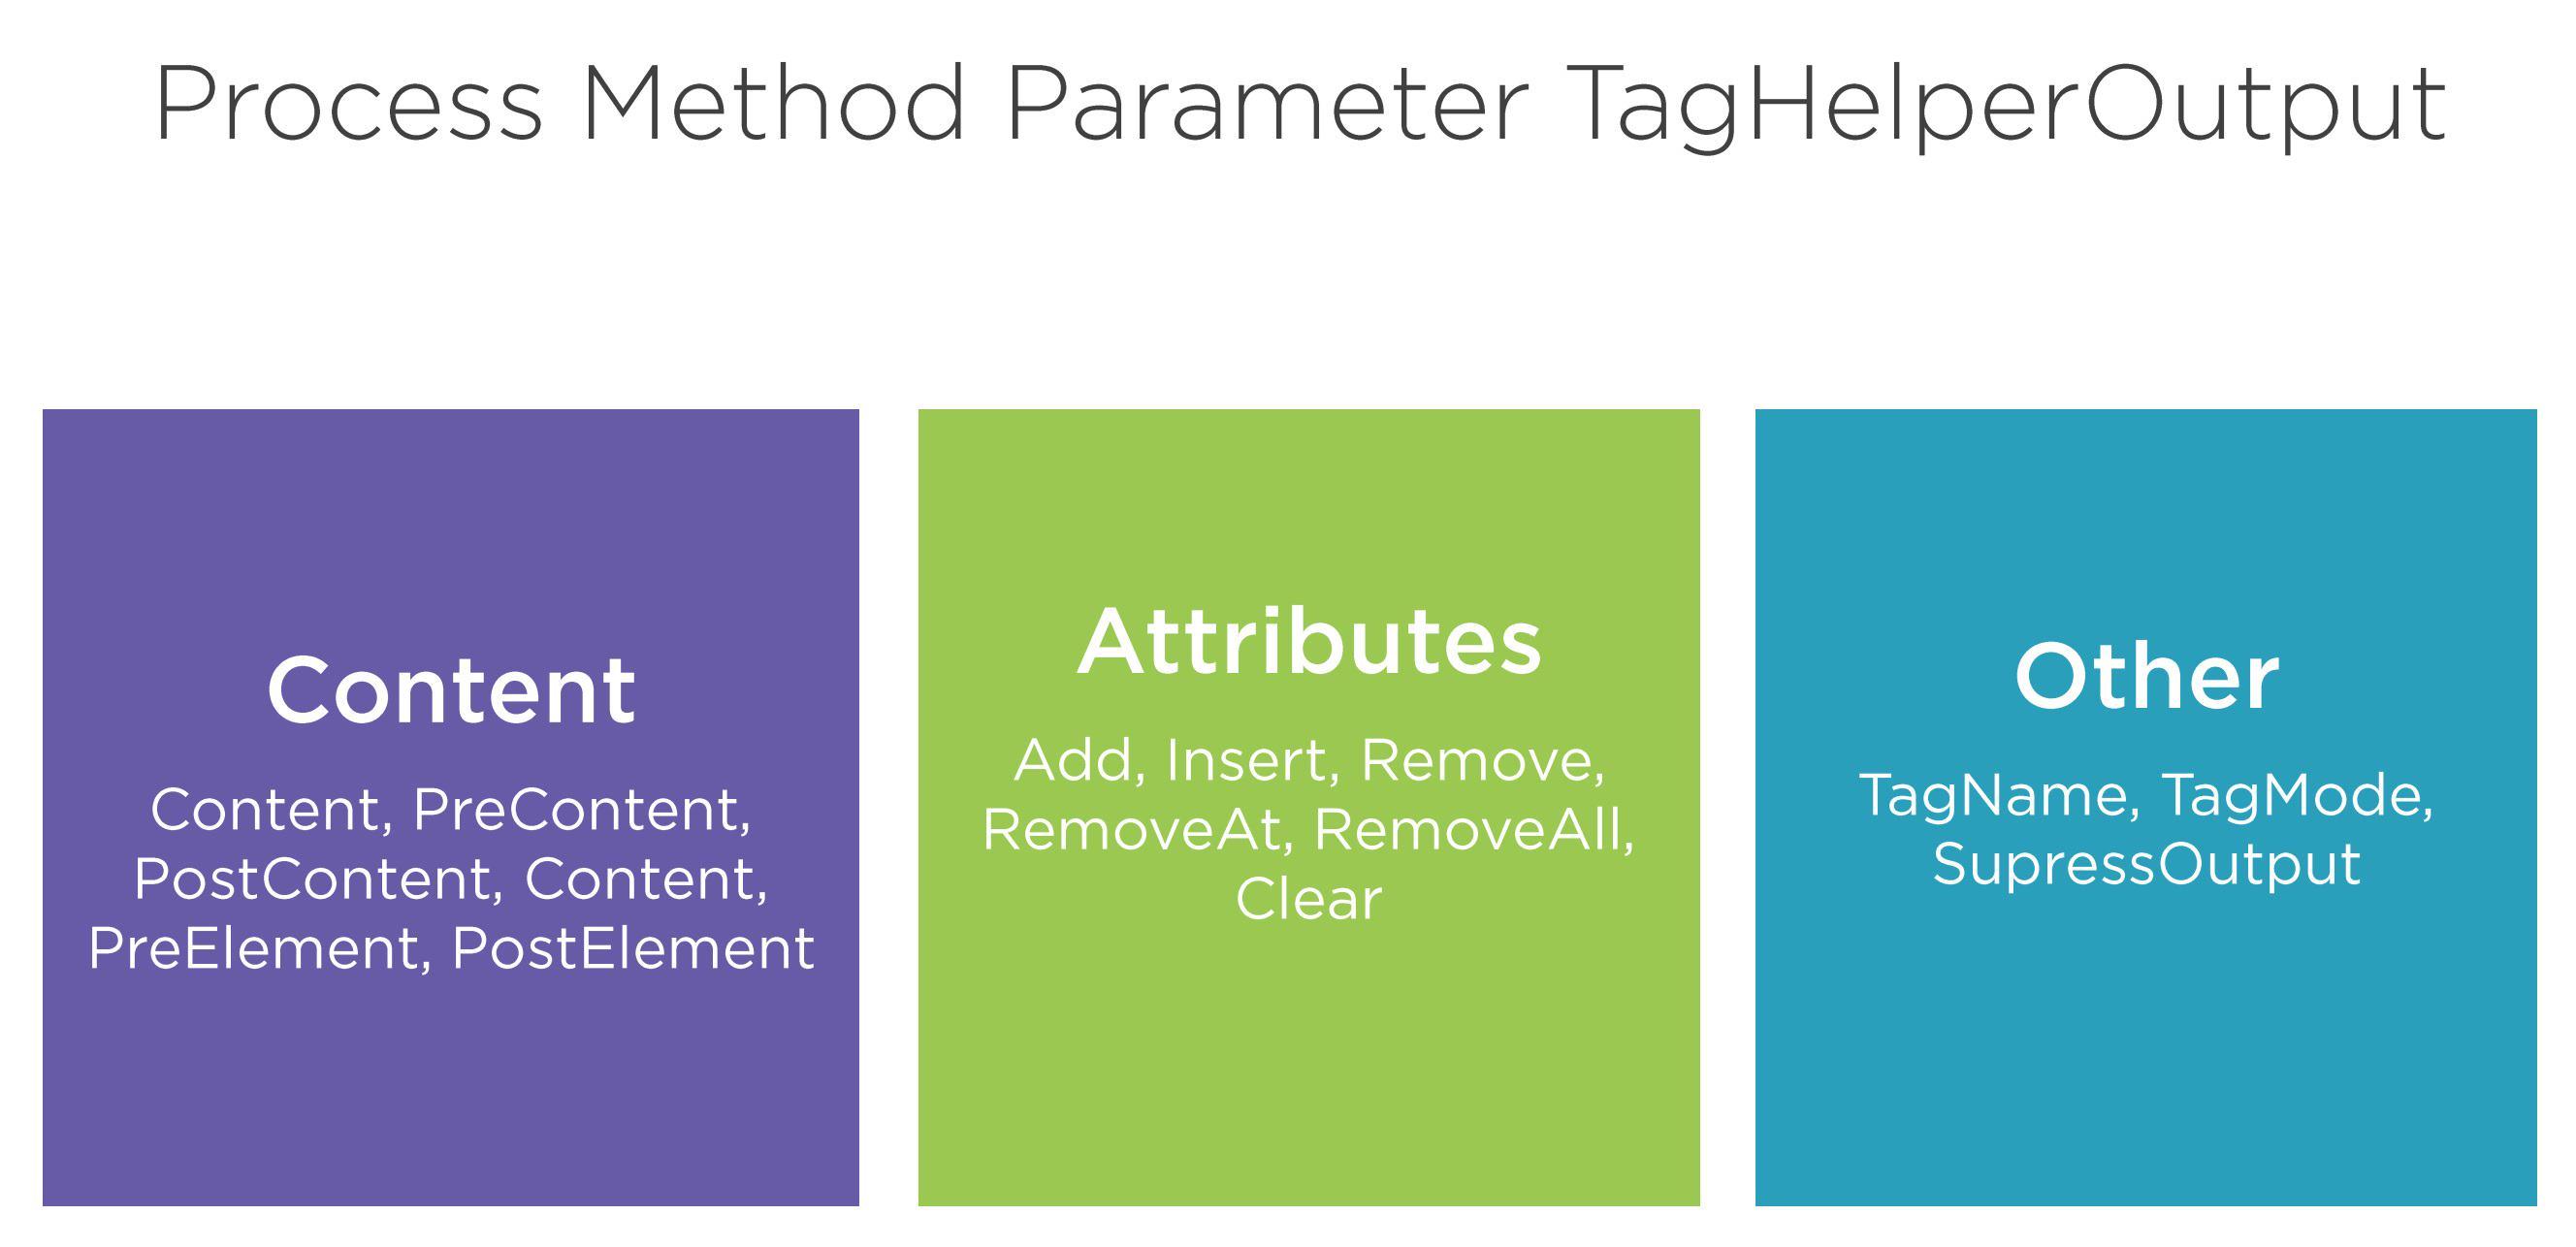 Process method parameter - TagHelperOutput